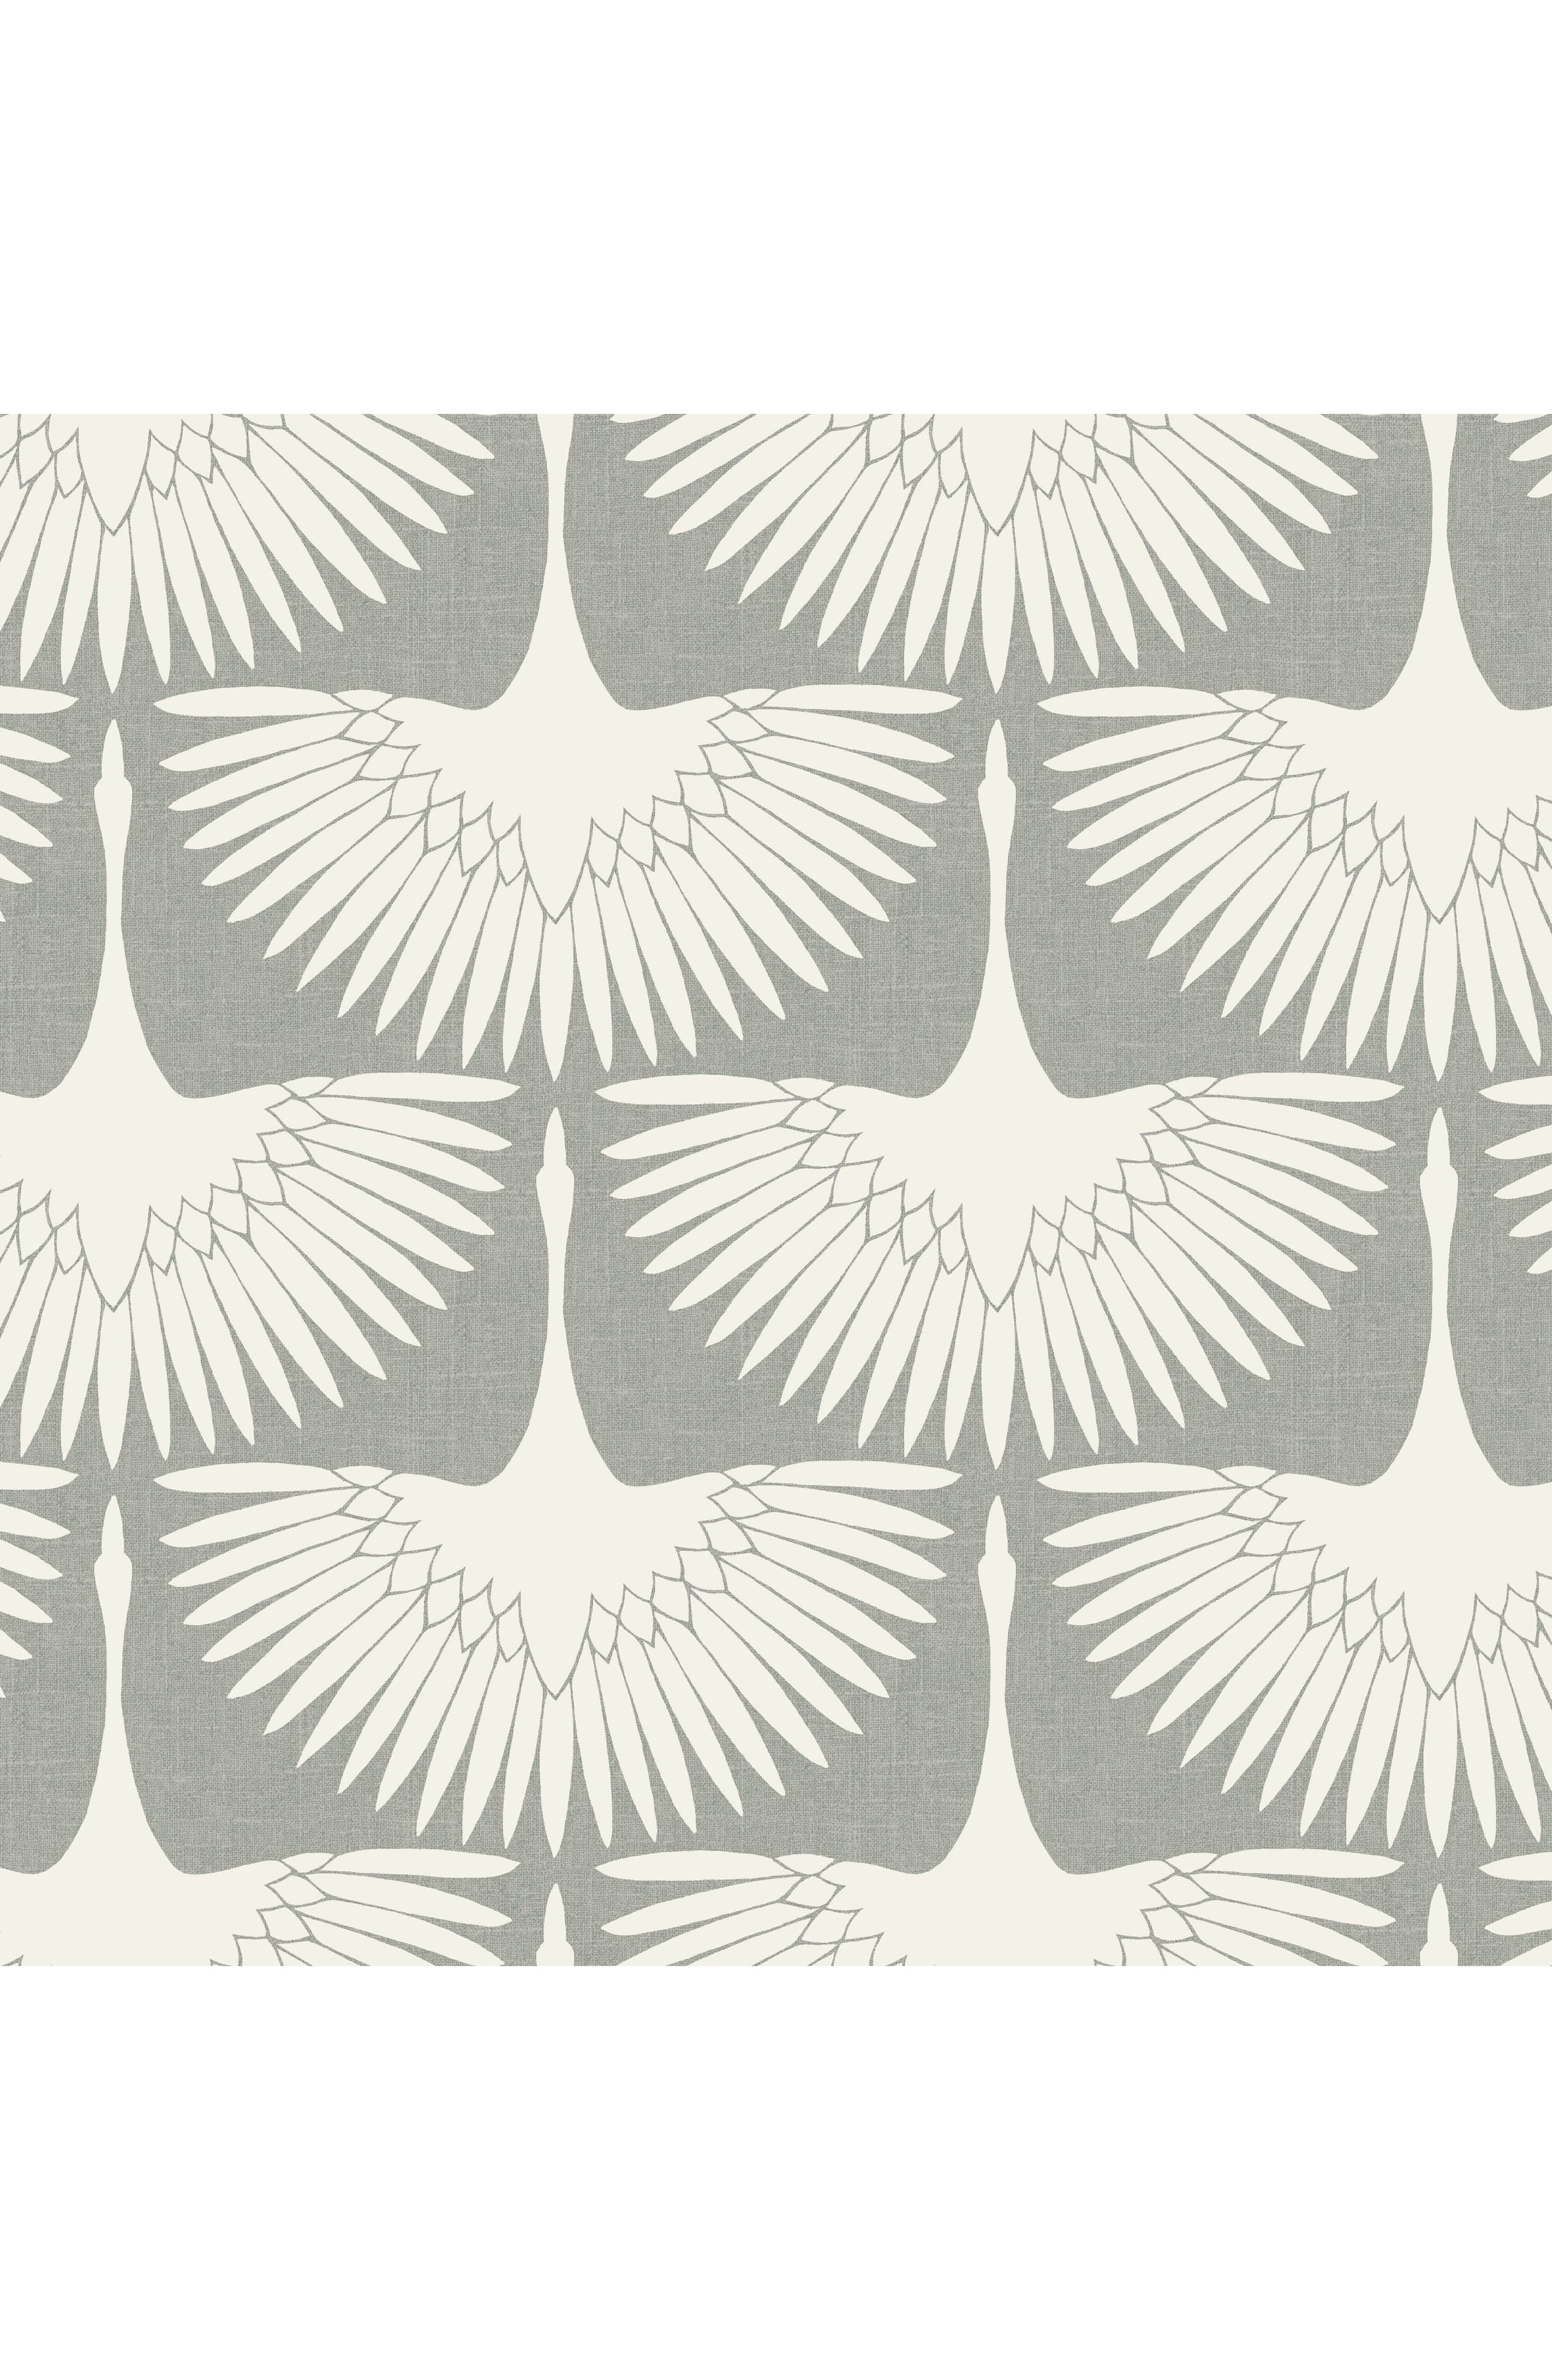 Feather Flock Vinyl Wallpaper,                             Main thumbnail 1, color,                             Chalk